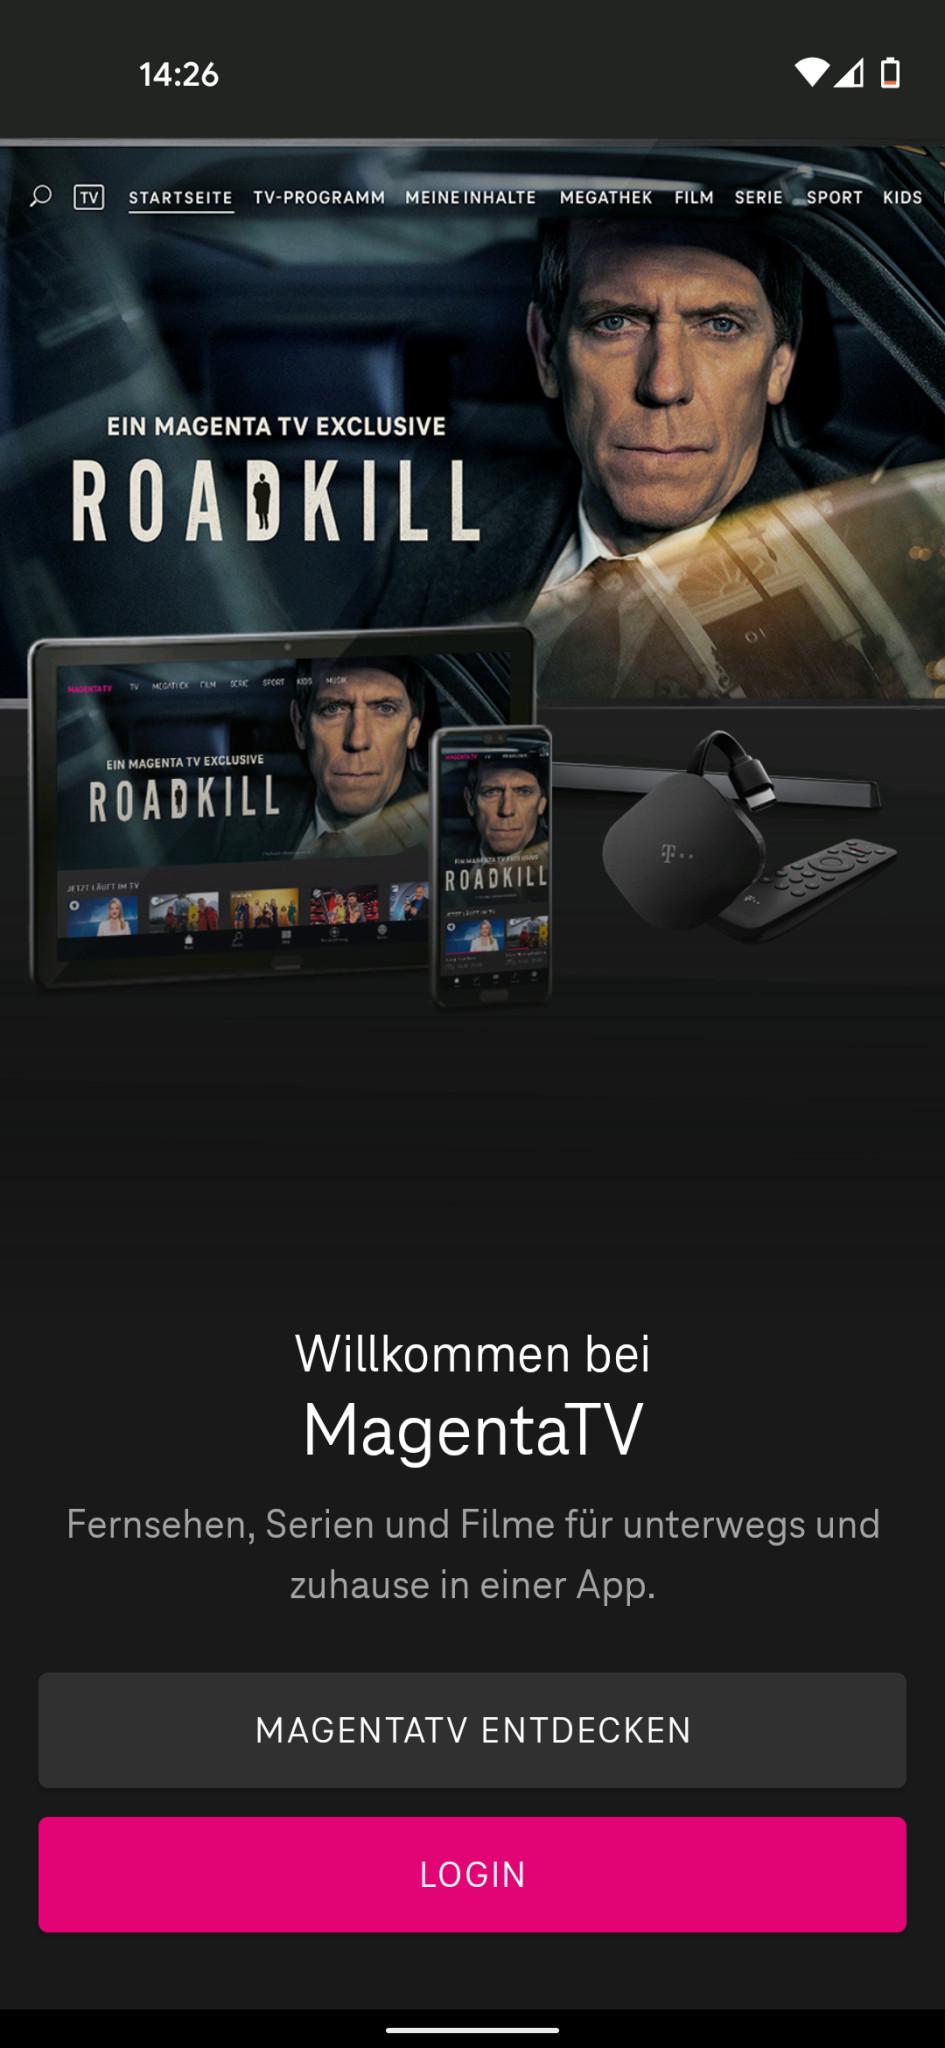 Screenshot 1 - MagentaTV (Android-App)